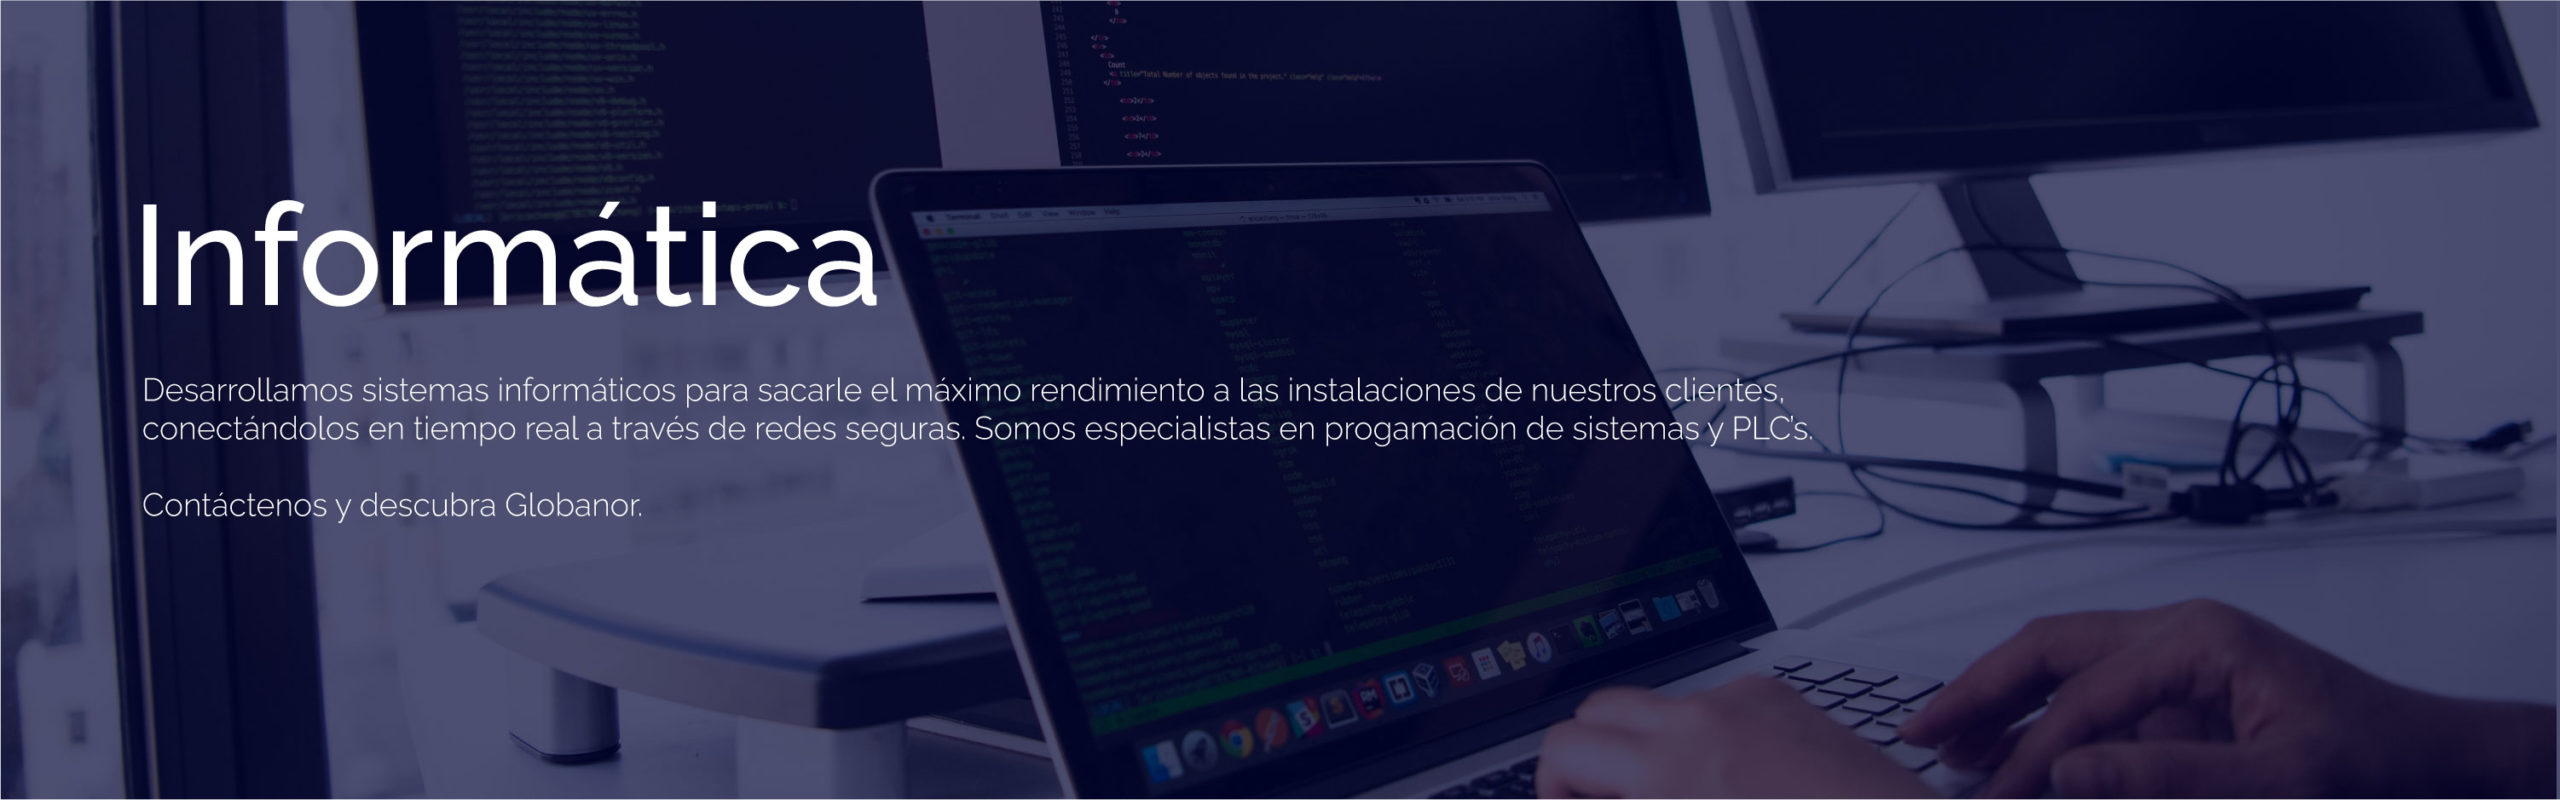 s_informatica